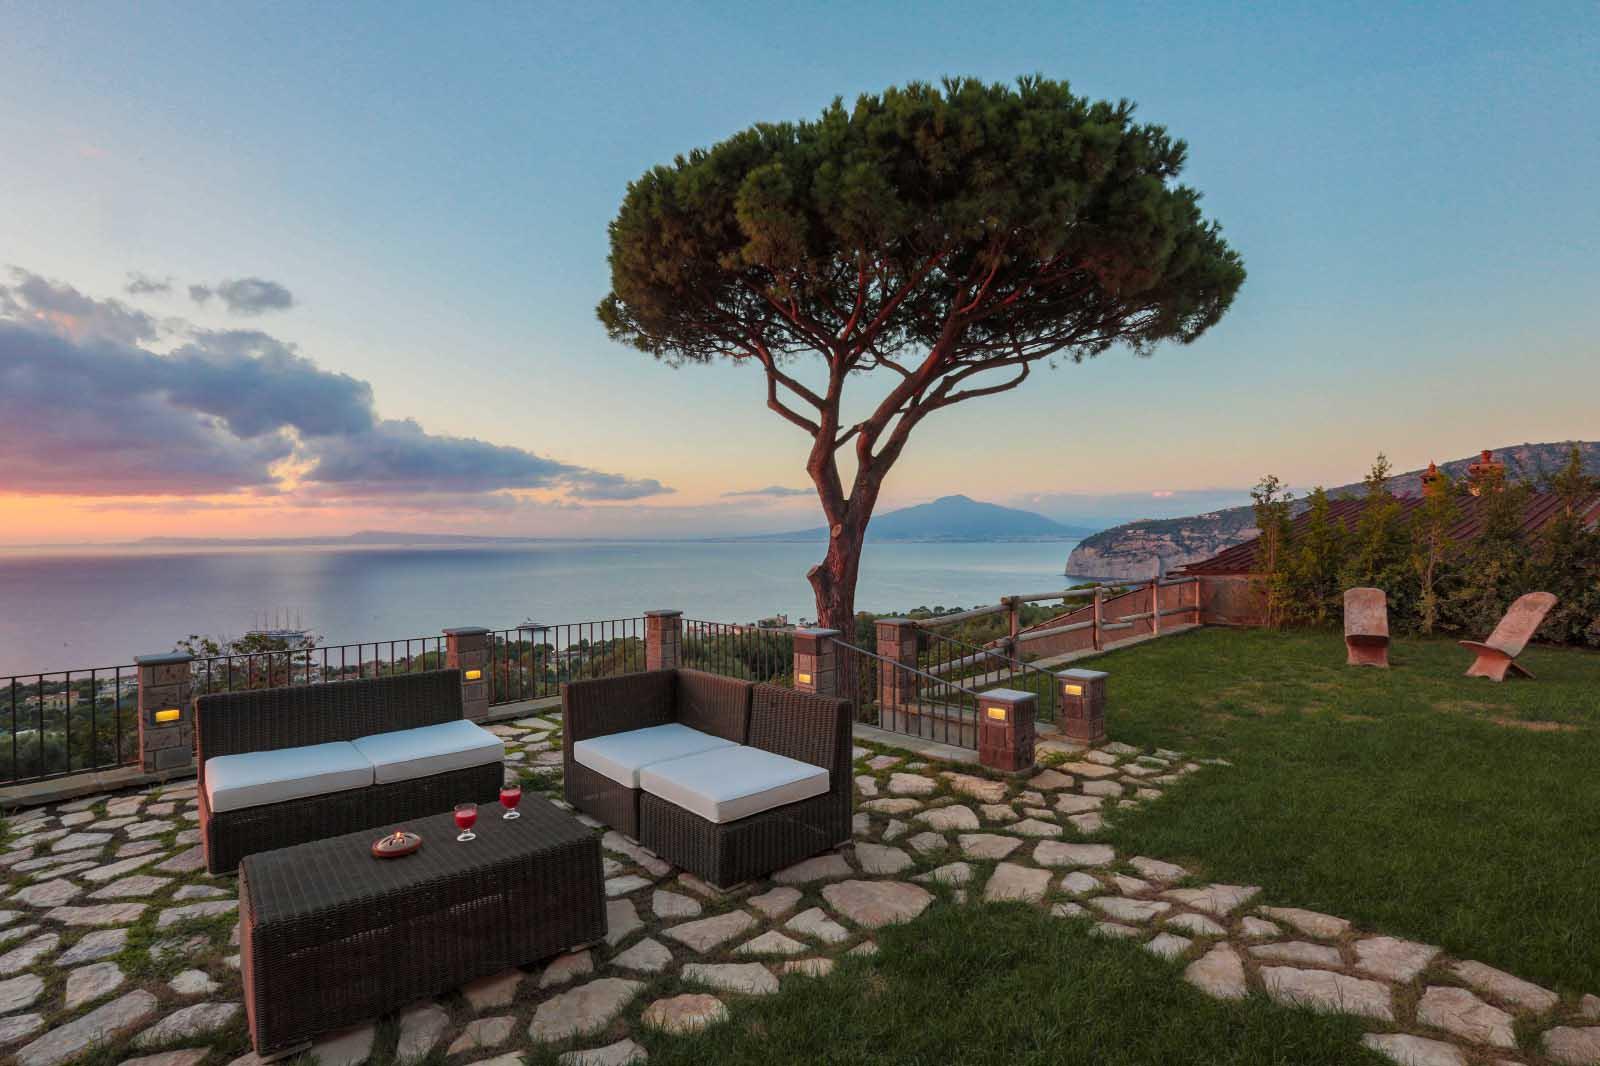 Sorrento Villa with swimming pool in April